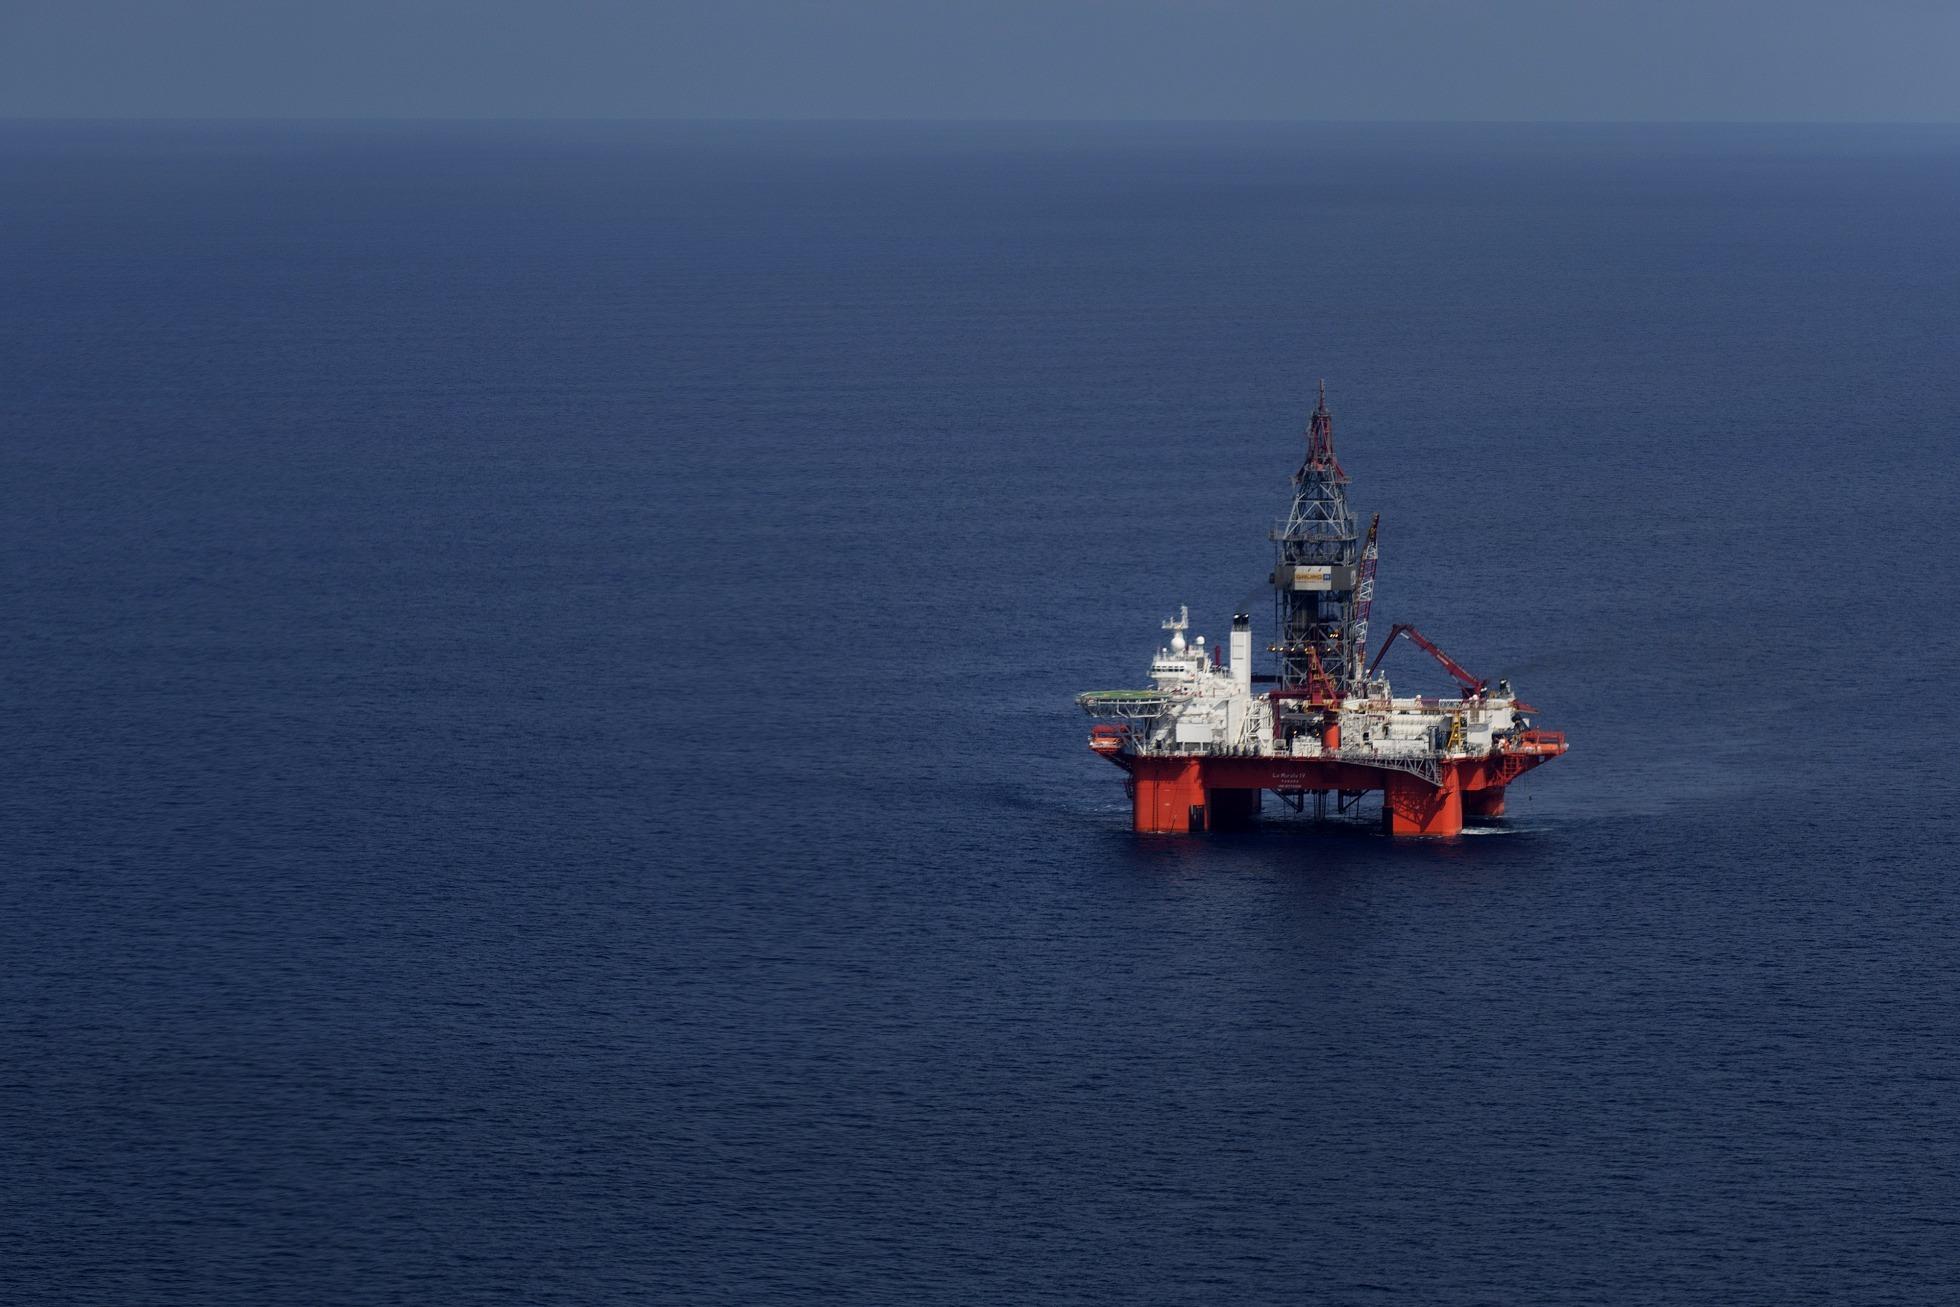 The Petroleos Mexicanos (Pemex) La Muralla IV deep sea crude oil platform stands in the waters off Veracruz, Mexico, on Friday, Aug. 30, 2013. Photographer: Susana Gonzalez/Bloomberg